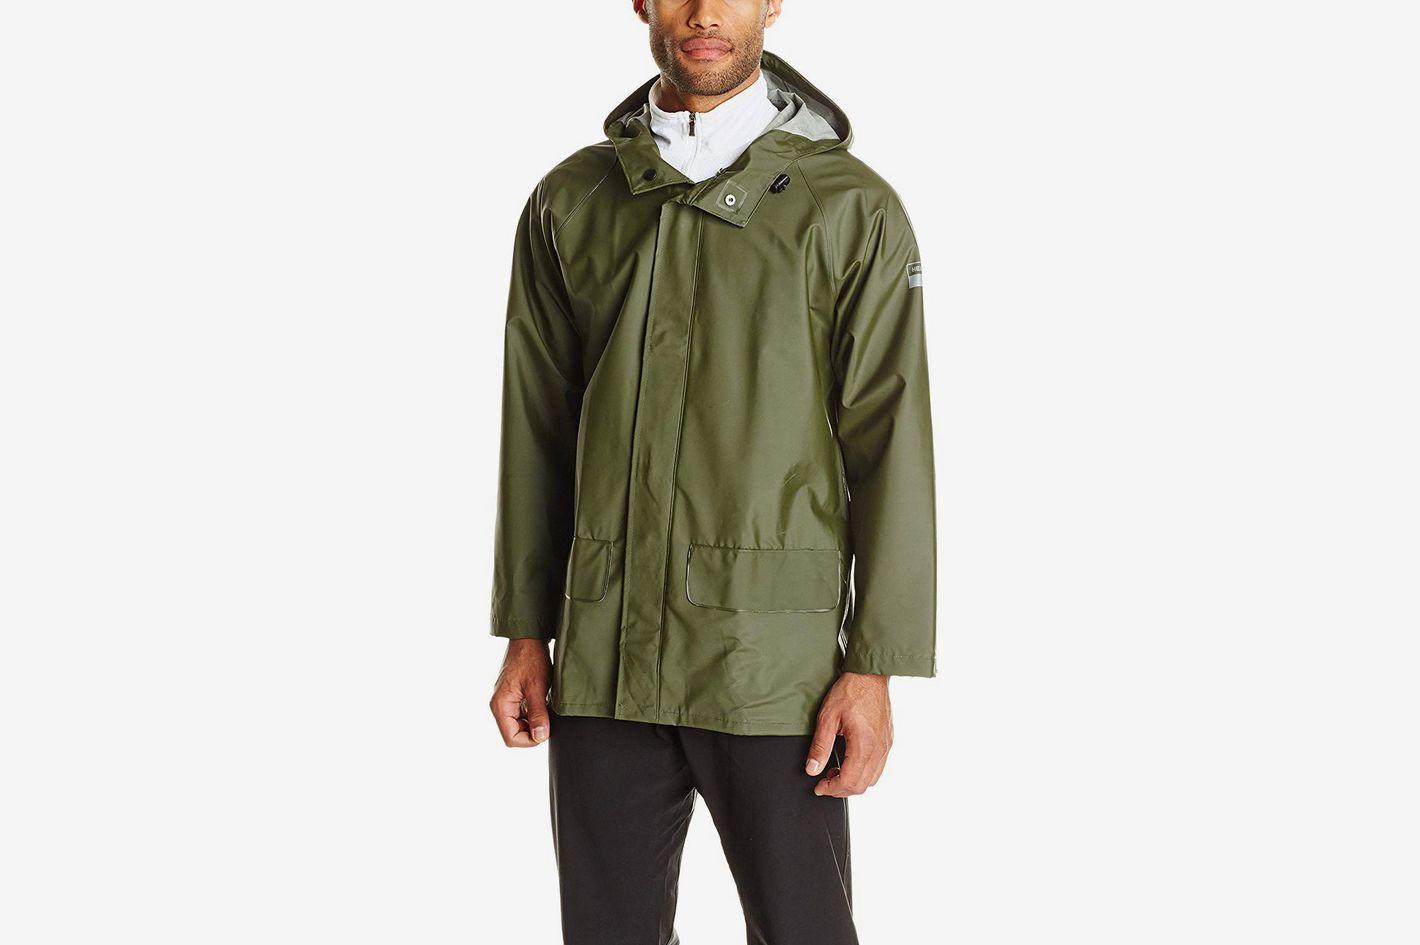 fe6cfe2f1 12 Best Rain Jackets and Rain Coats for Men 2019